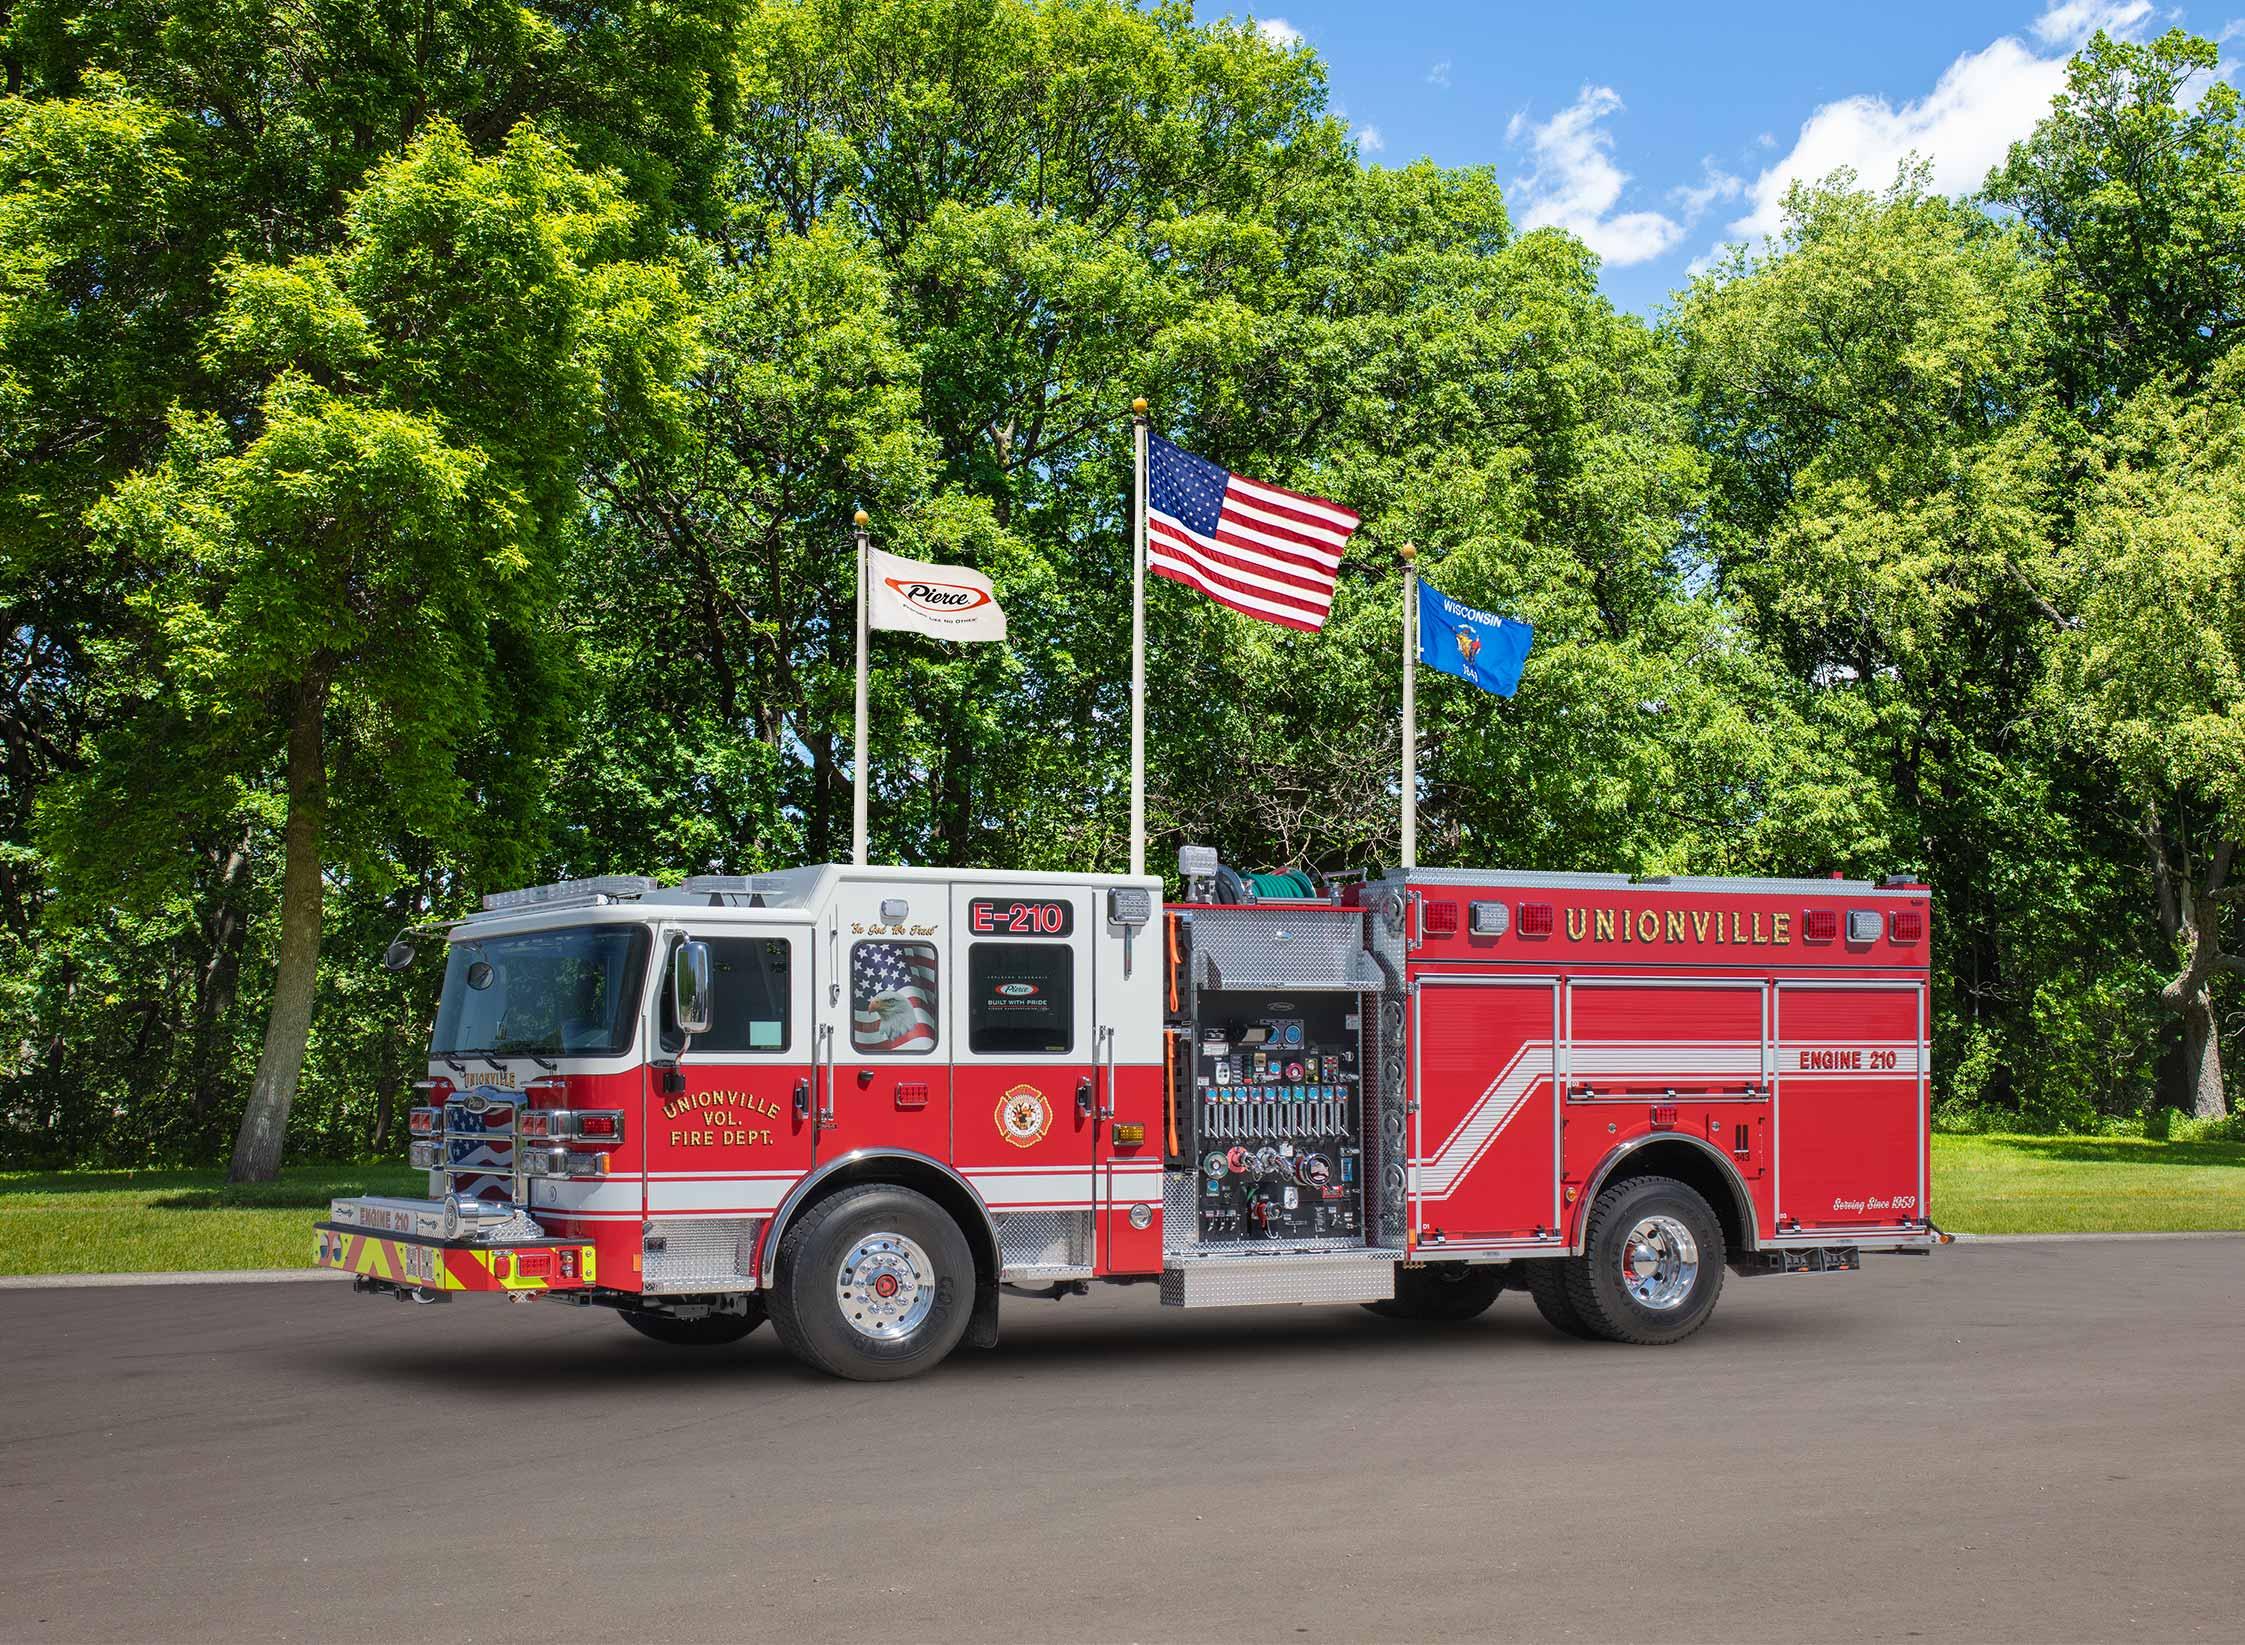 Town of Unionville Fire Department - Pumper